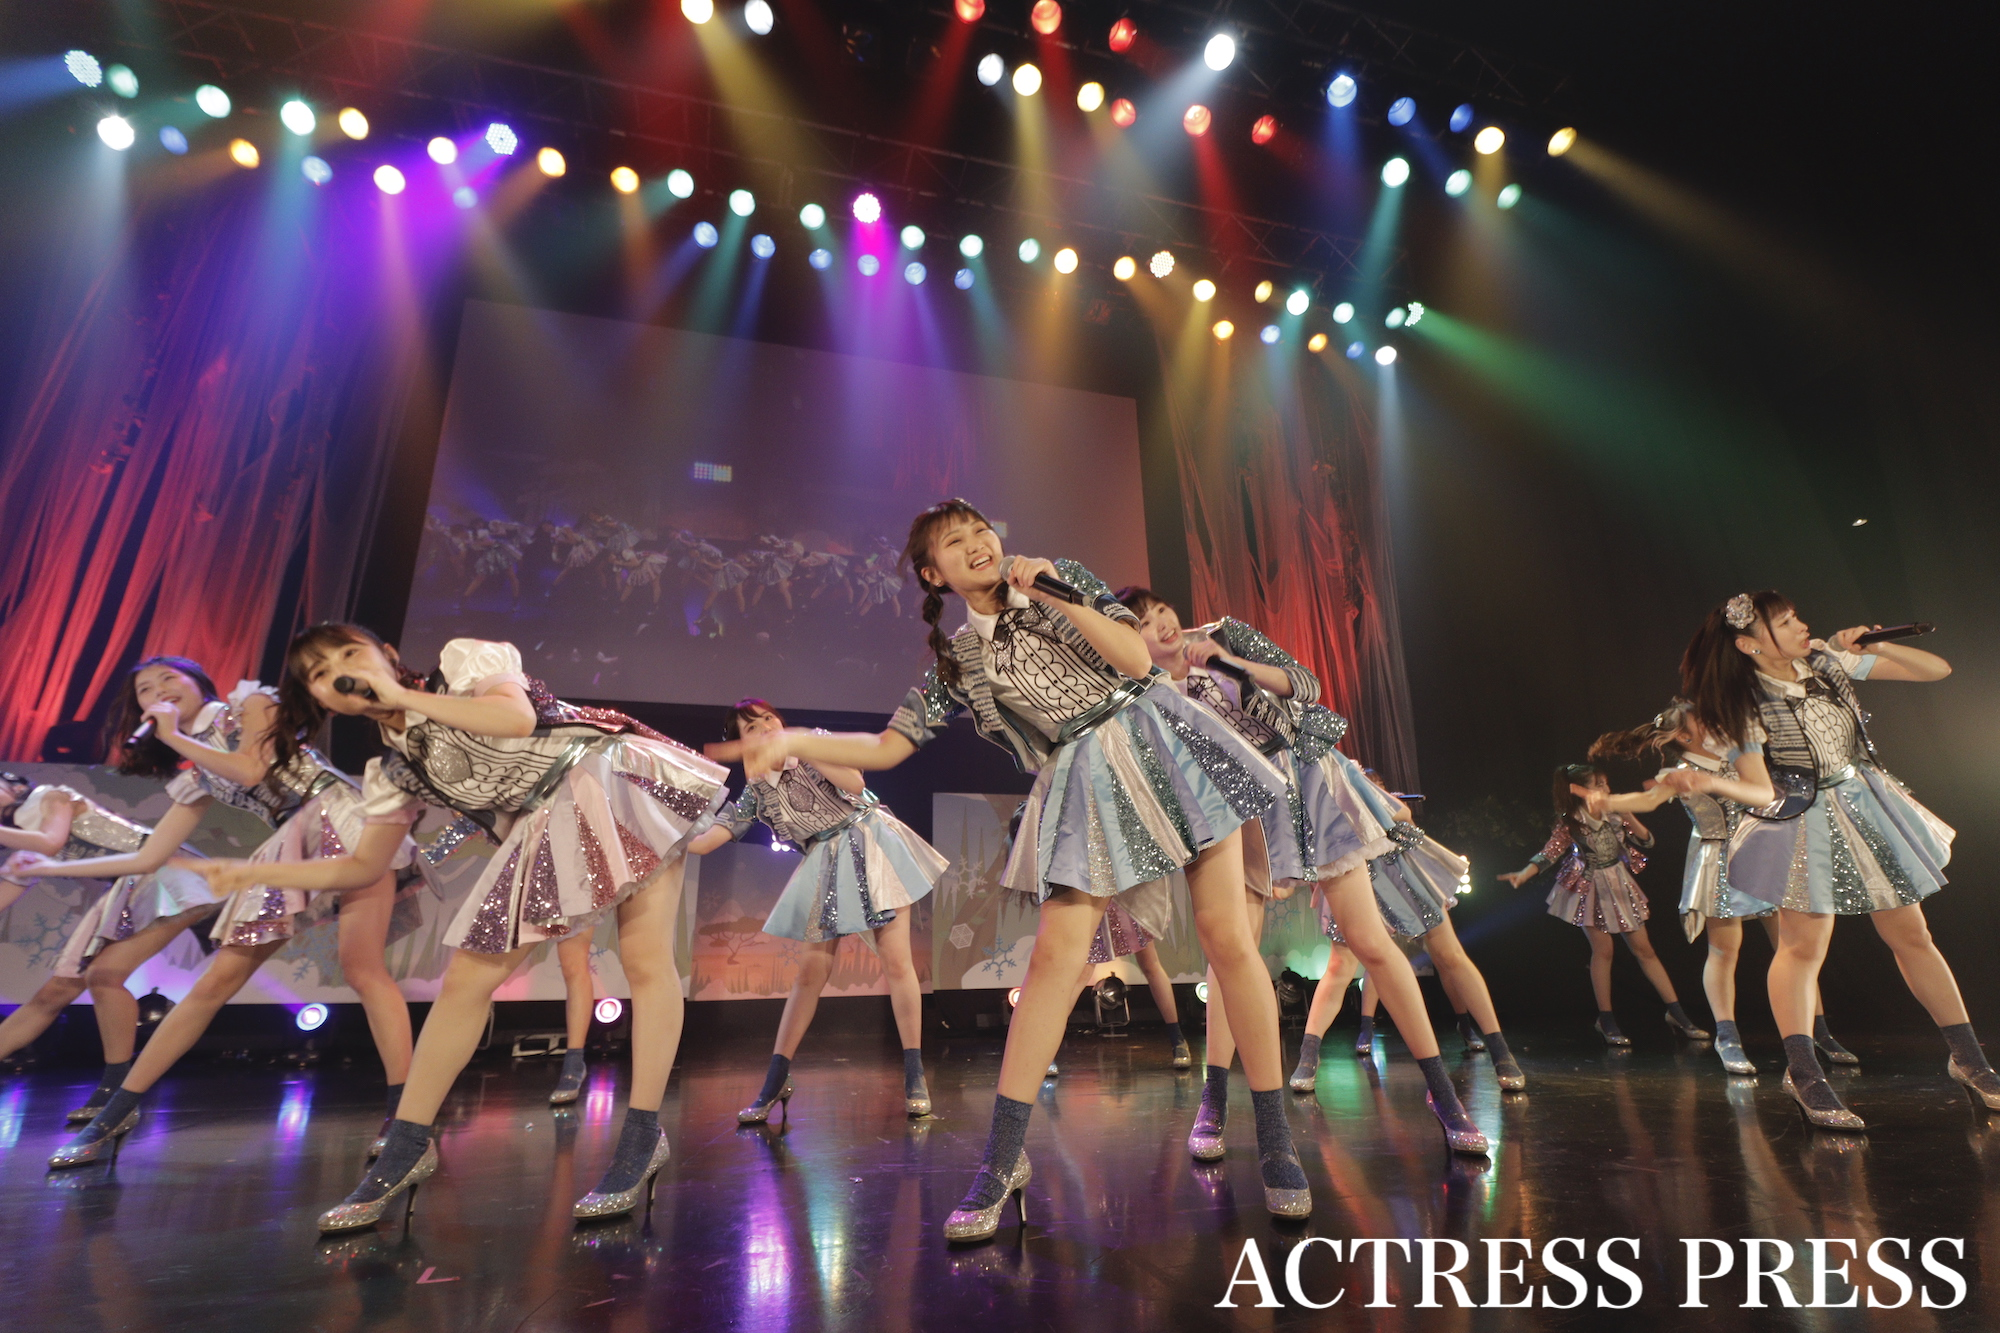 AKB48フレッシュ選抜/2020年2月13日、全国大学対抗アイドルコピーダンスコンテスト「UNIDOL2019-20 Winter supported by Sammy」/撮影:ACTRESS PRESS編集部